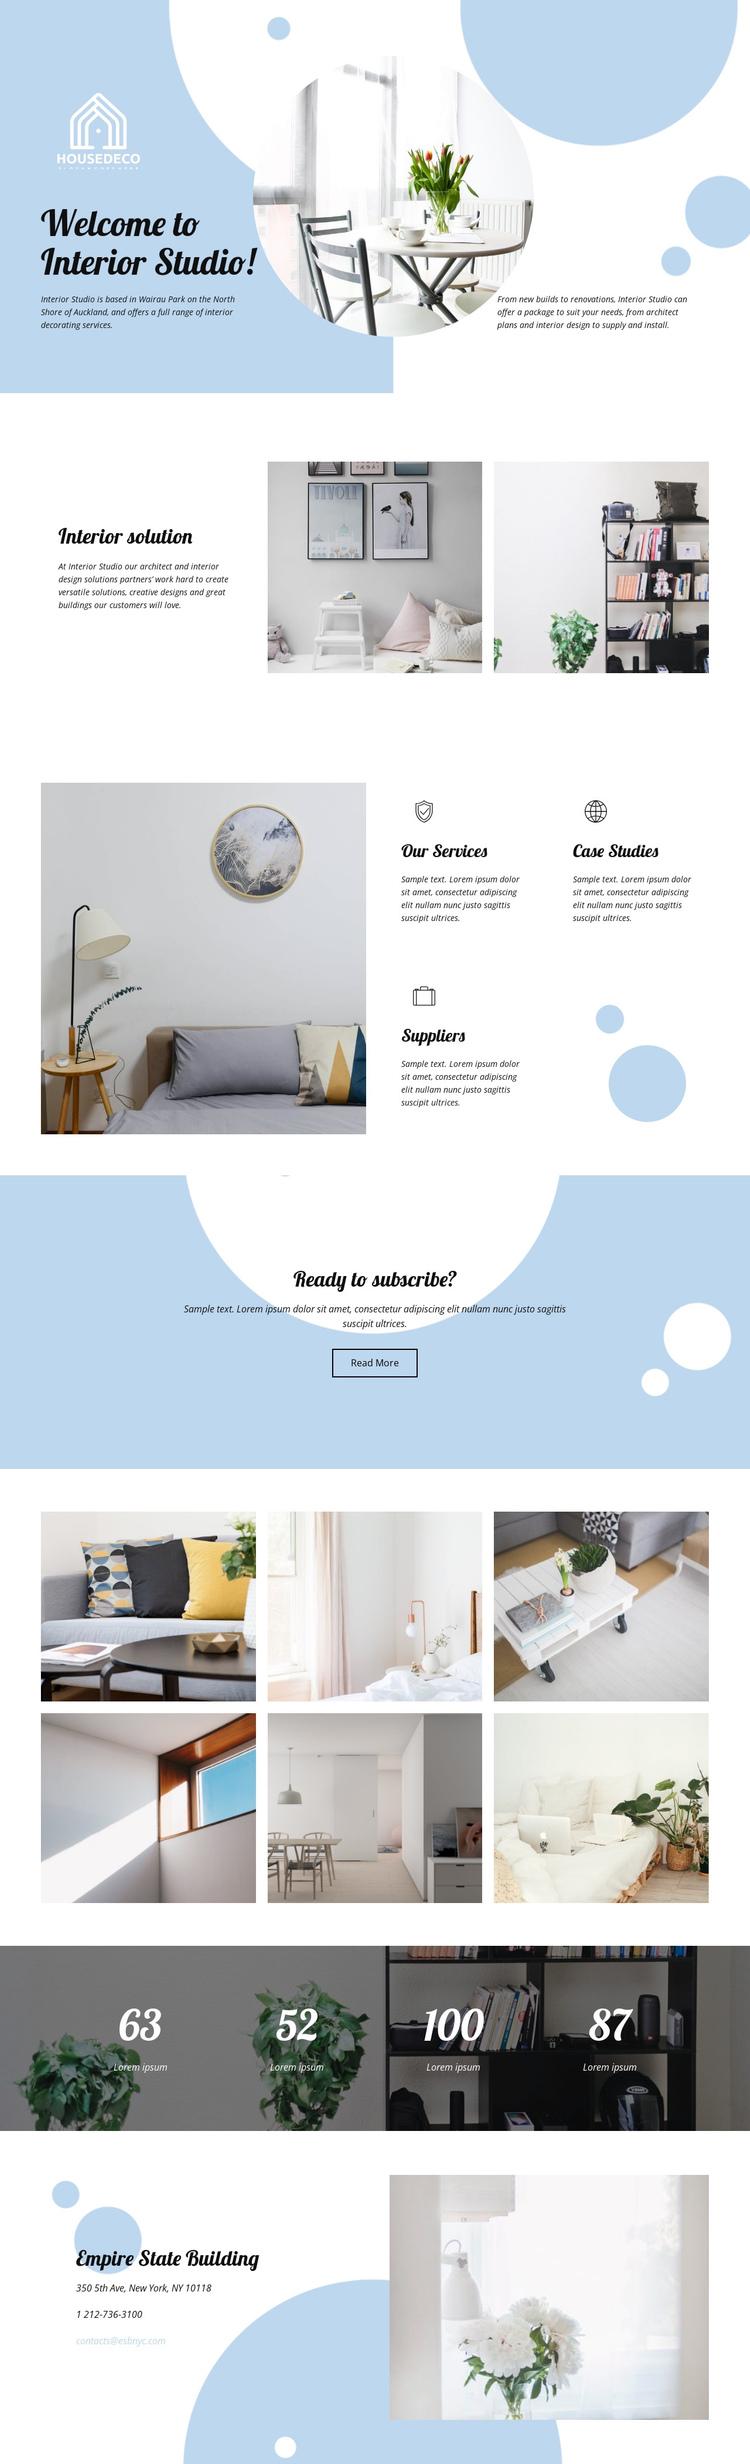 Interior Studio One Page Template